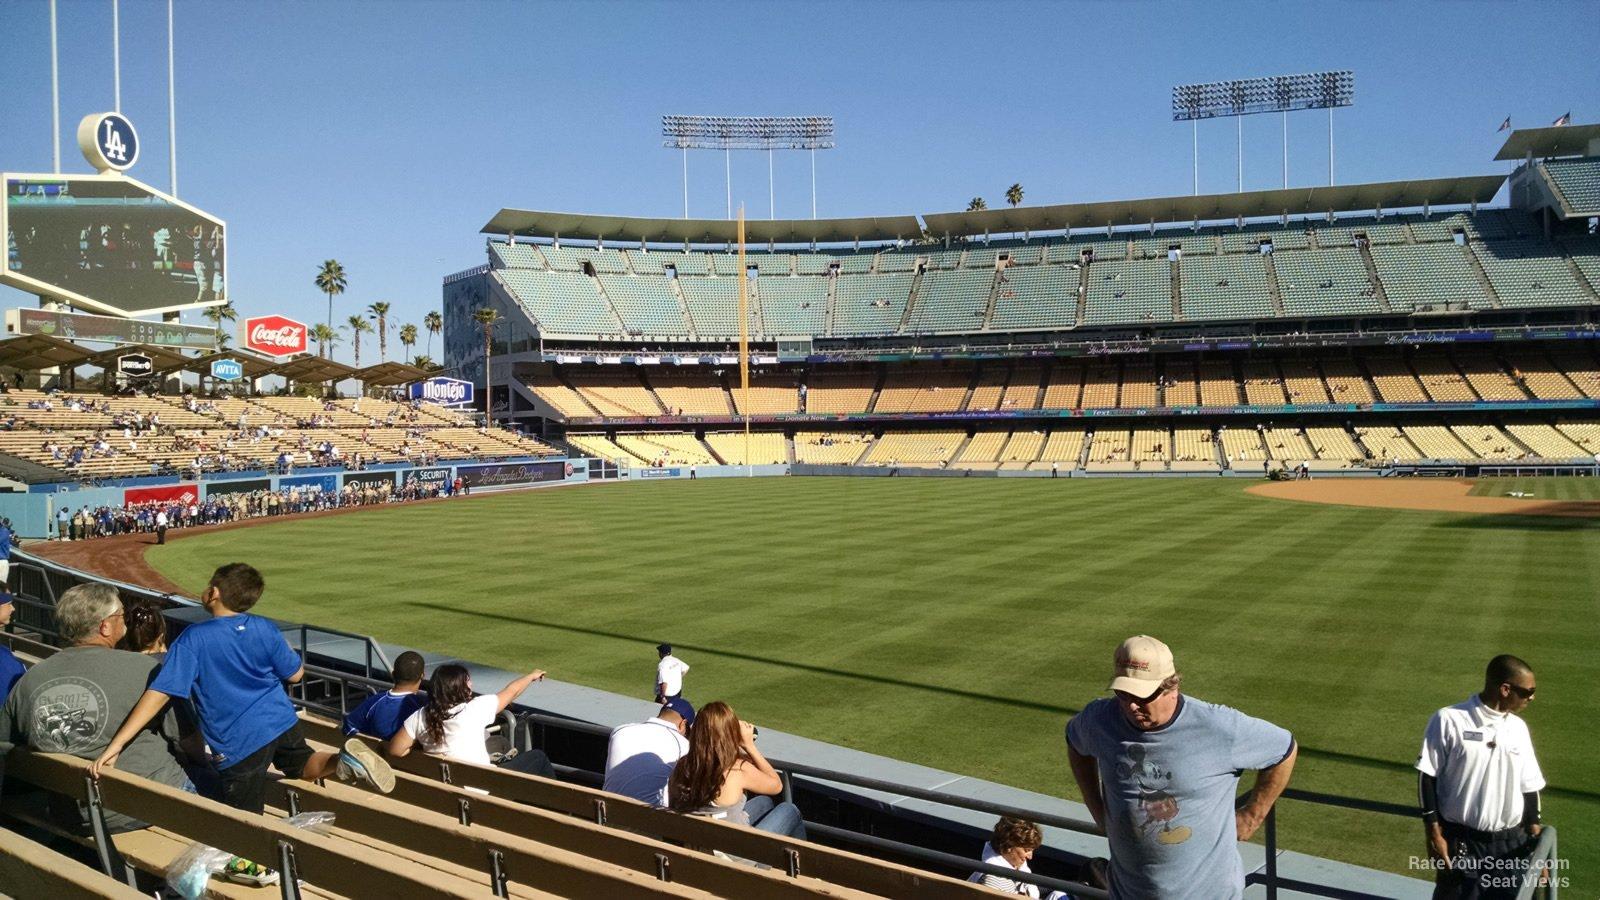 Dodger Stadium Section 301 - RateYourSeats.com